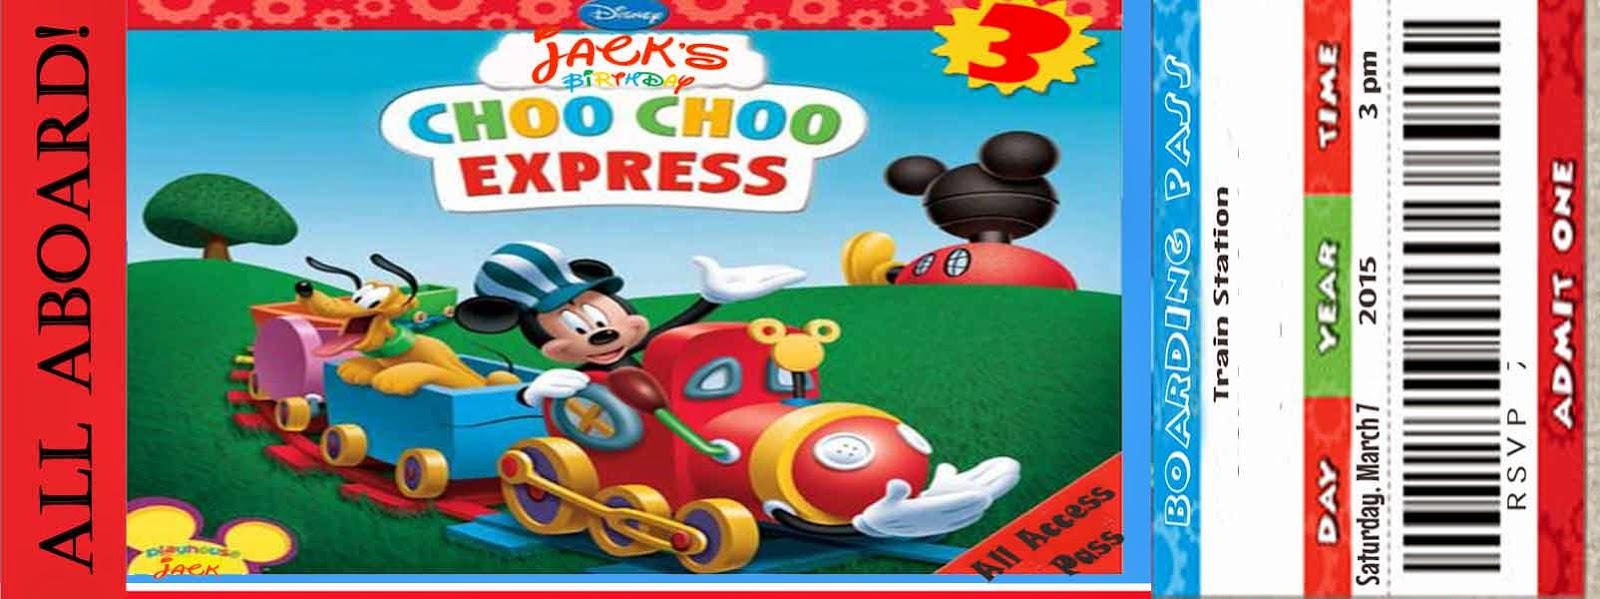 Hargrave family jacks mickey choo choo express birthday party filmwisefo